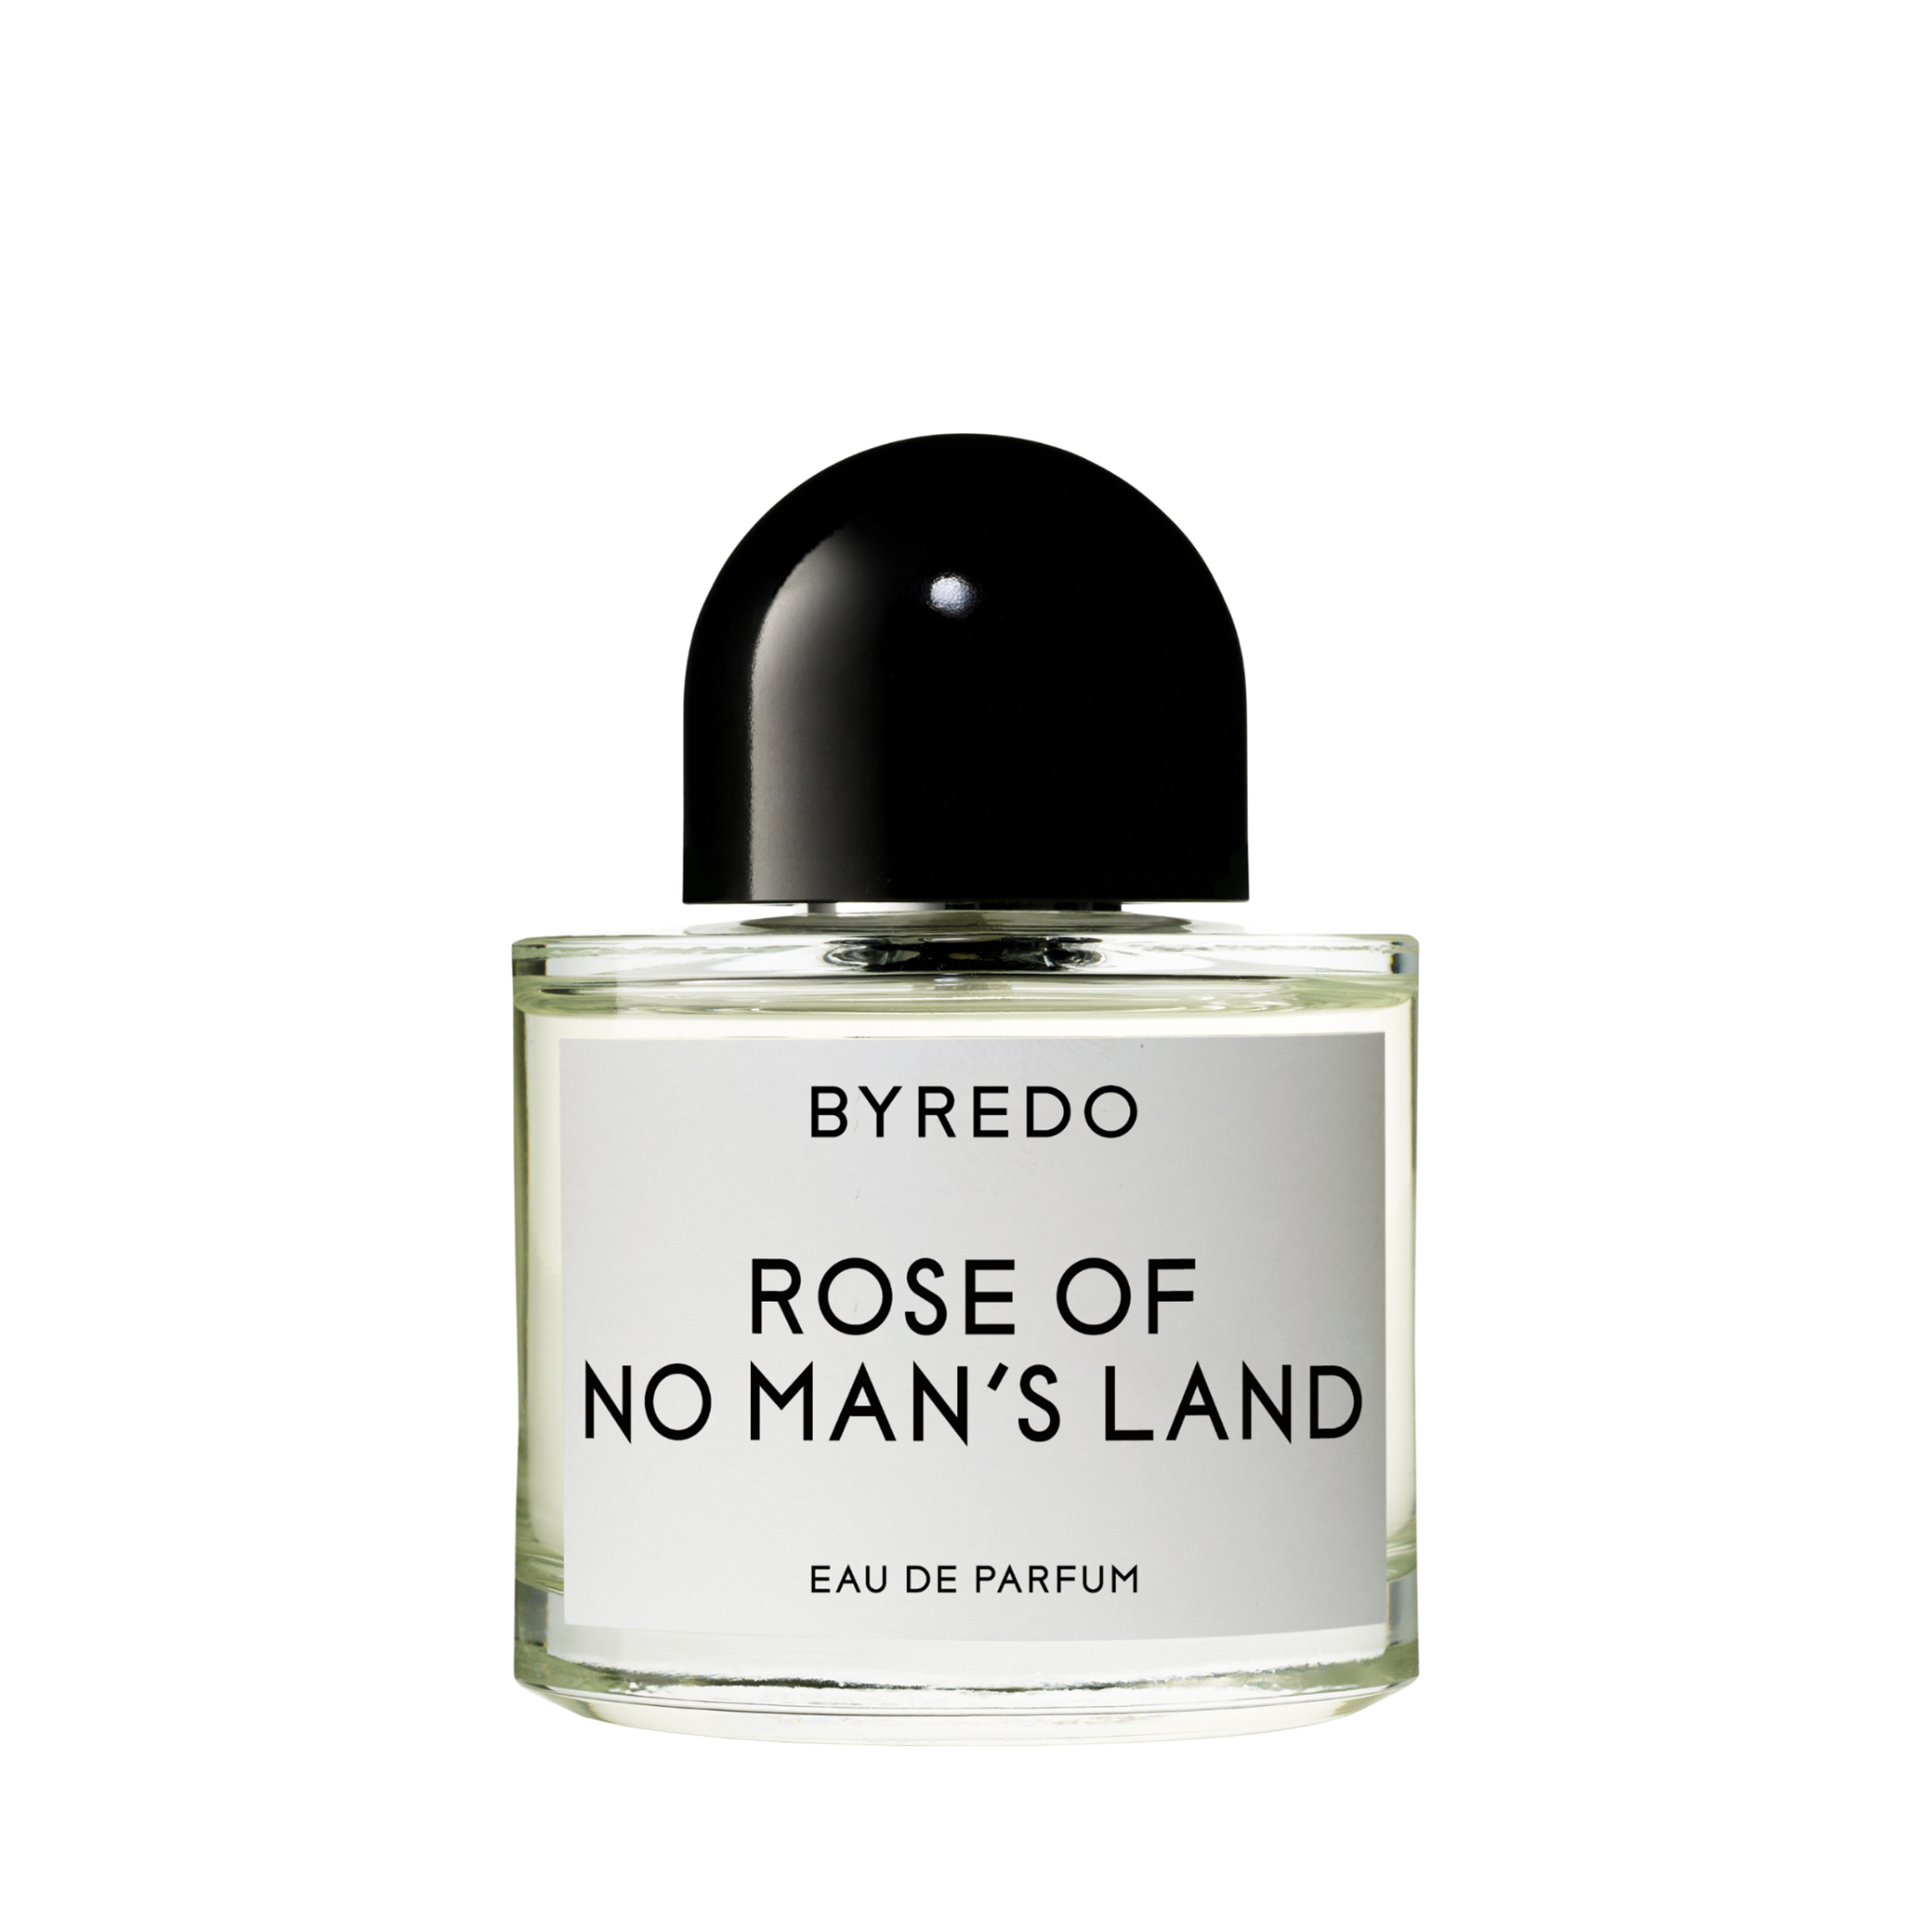 Купить BYREDO Парфюмерная вода «ROSE OF NO MAN'S LAND» 50 мл